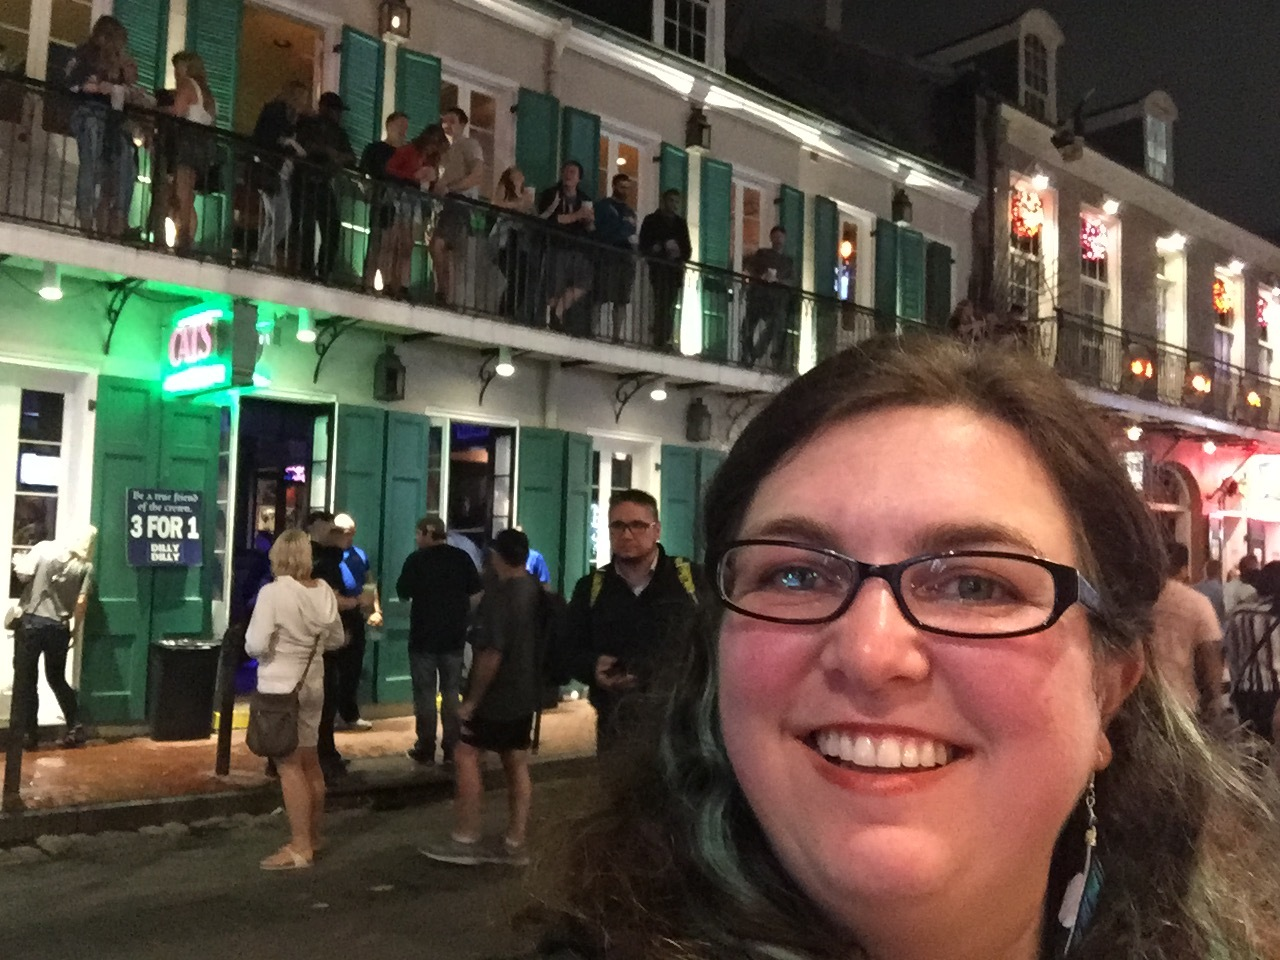 Blurry selfie on Bourbon Street. Blur-bon Street.